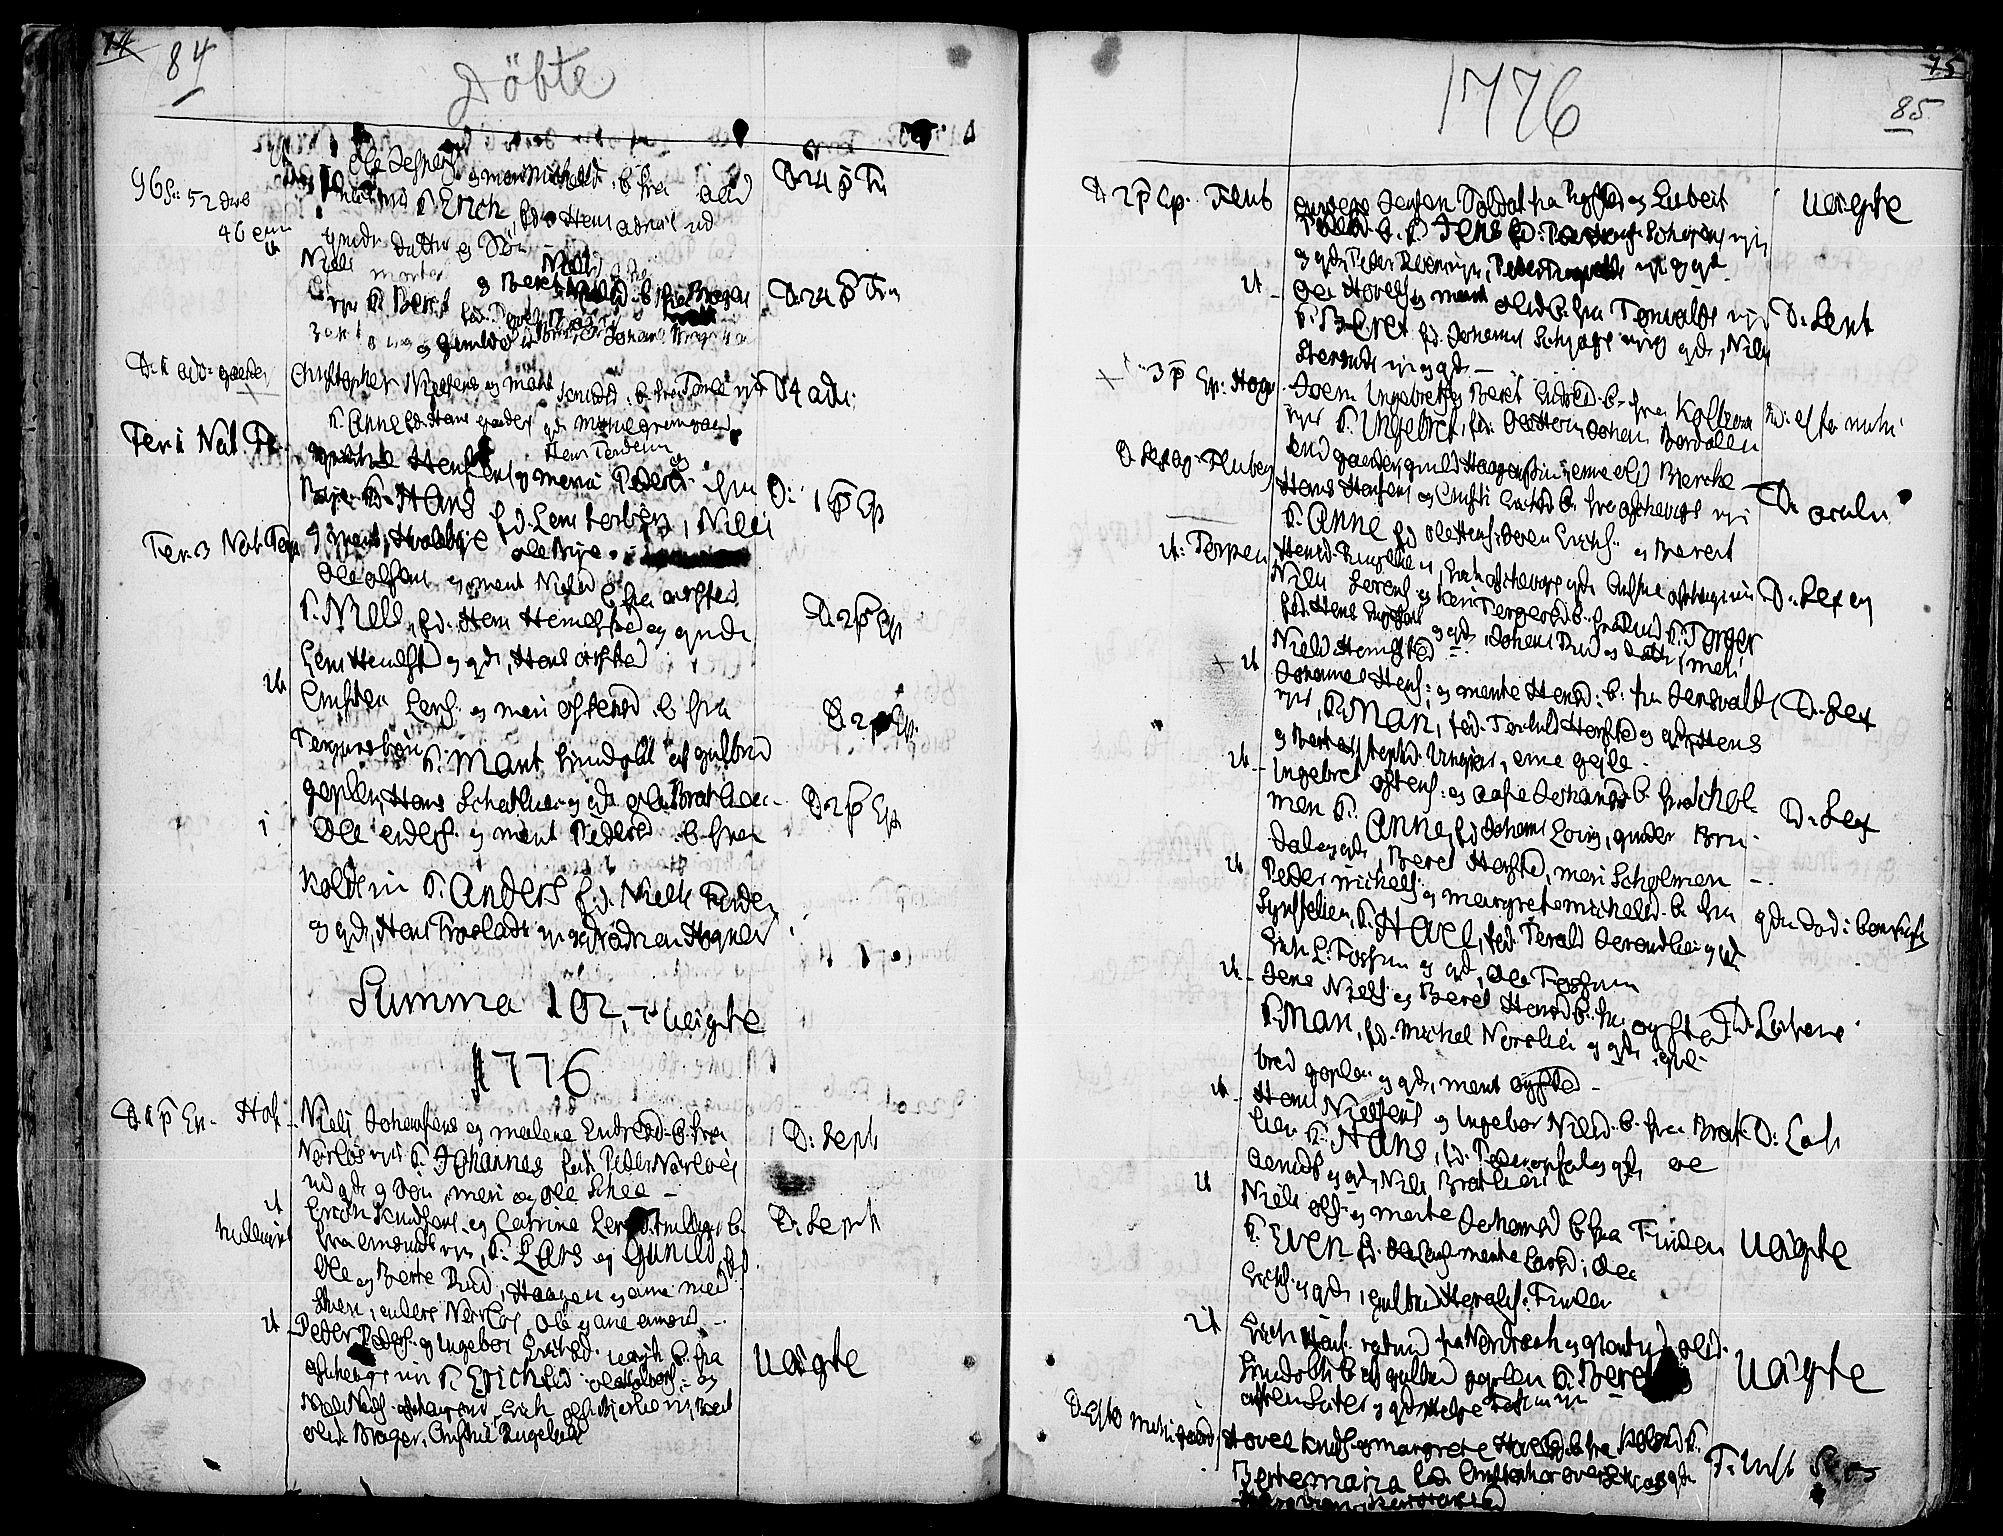 SAH, Land prestekontor, Ministerialbok nr. 5, 1765-1784, s. 84-85